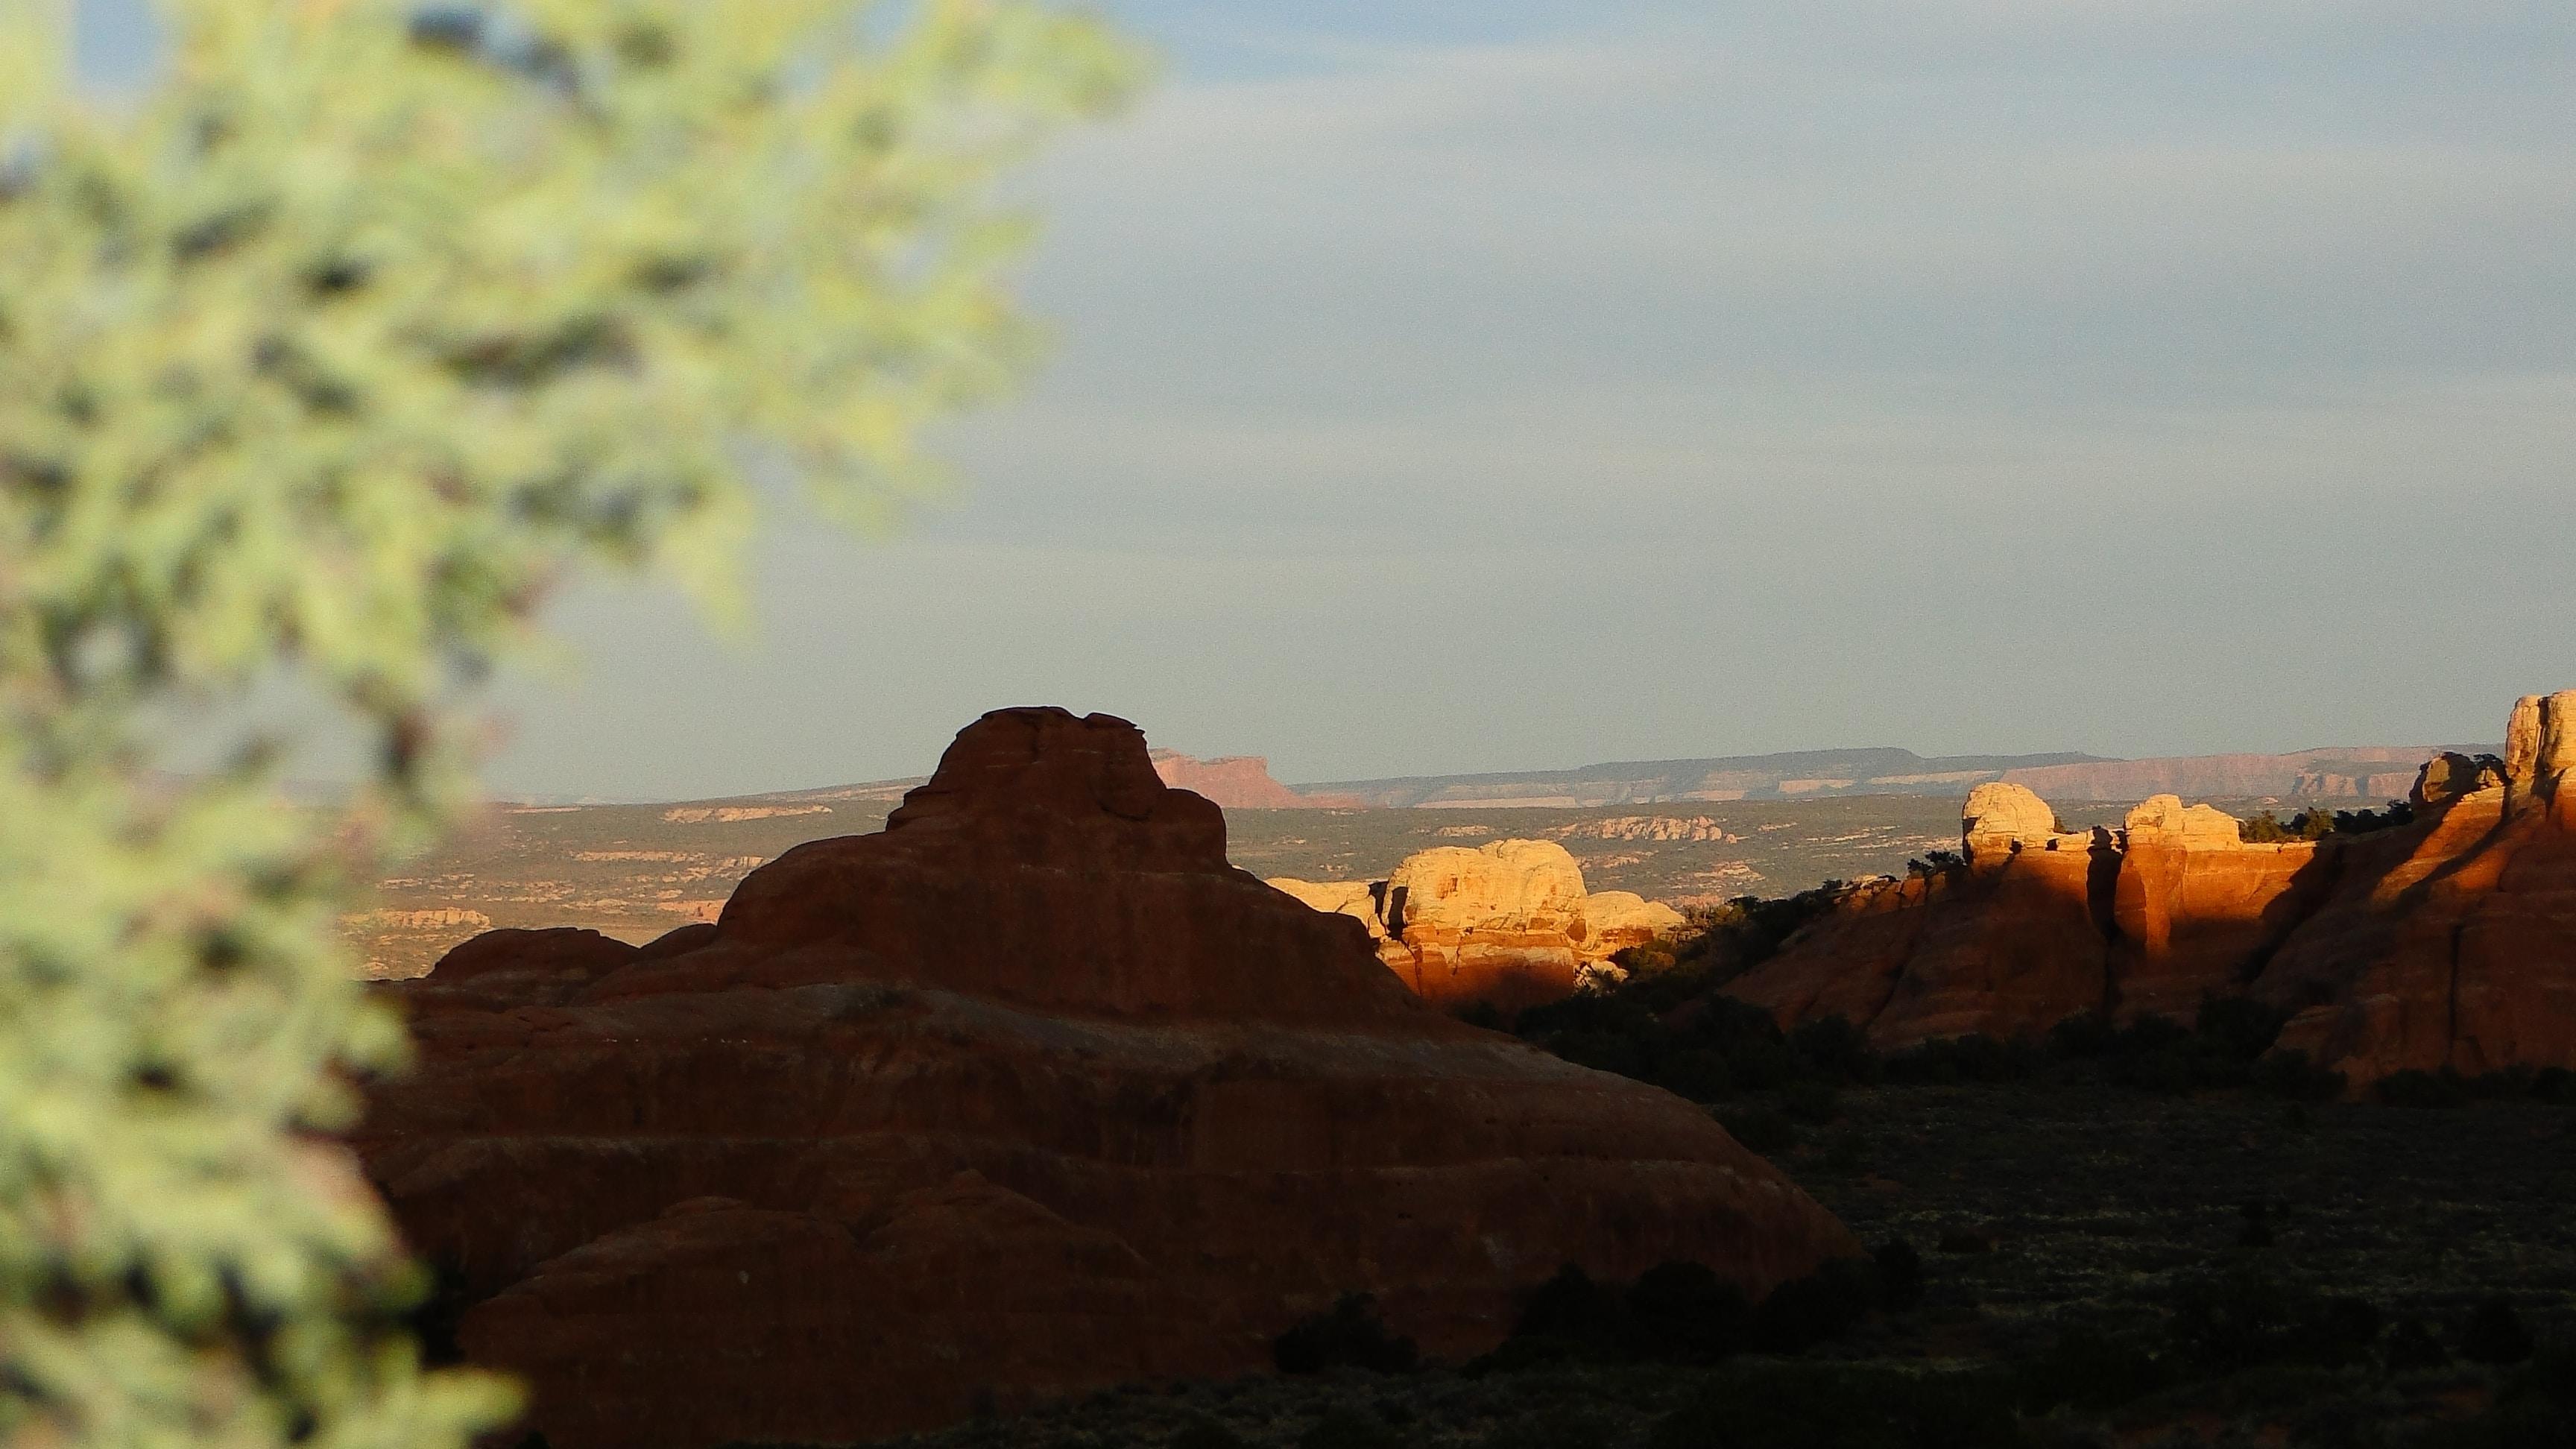 brown fault block mountains during daytime